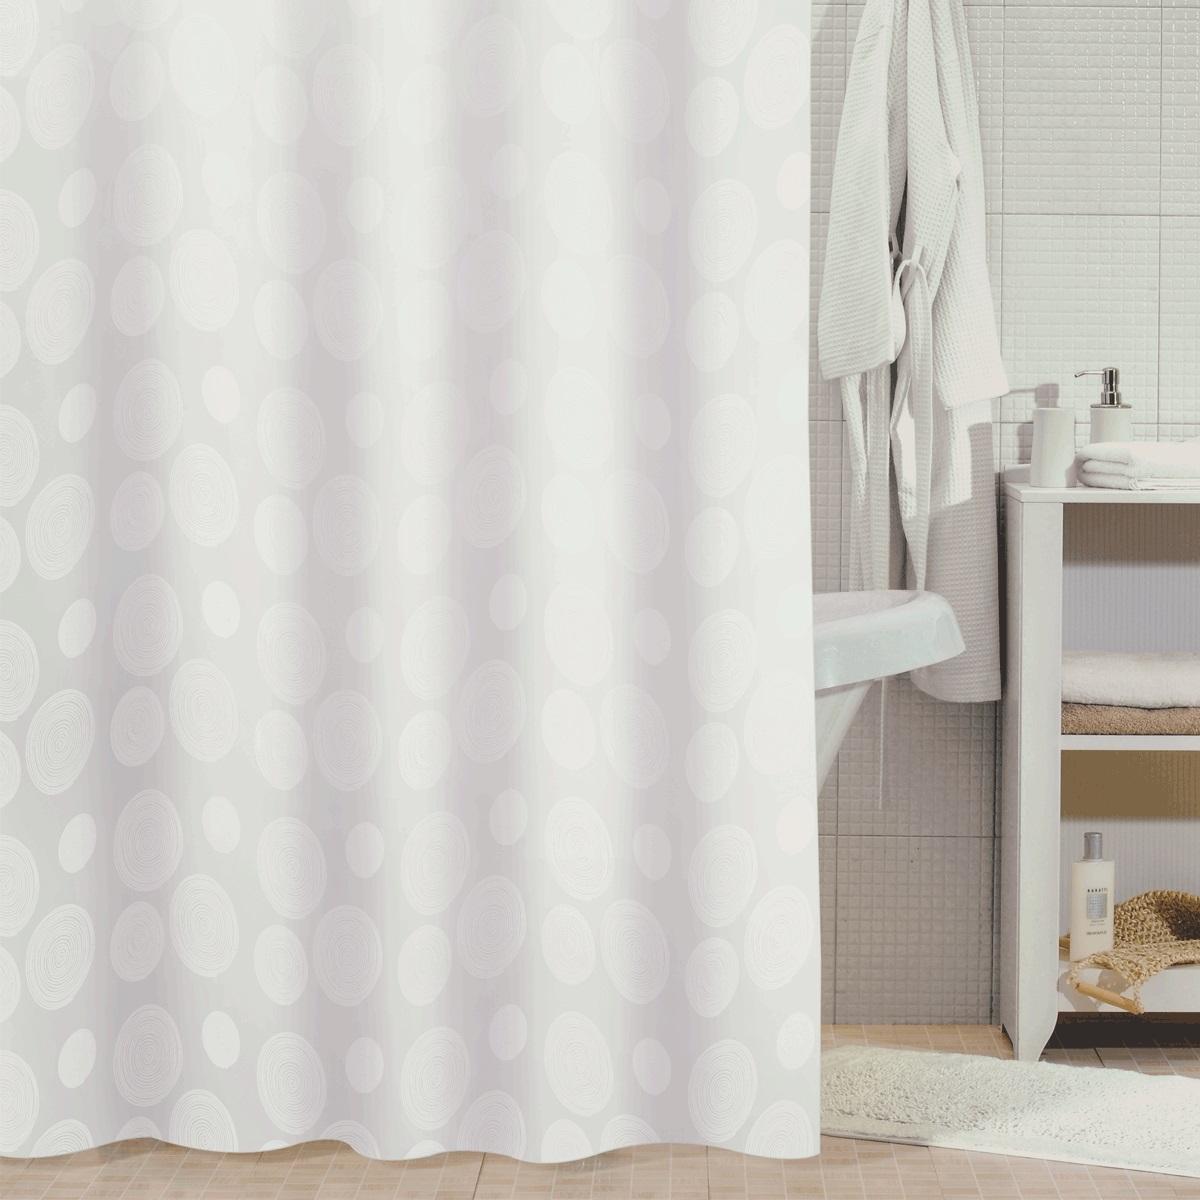 Штора для ванной Milardo White Mist, цвет: белый, 180 x 180 см